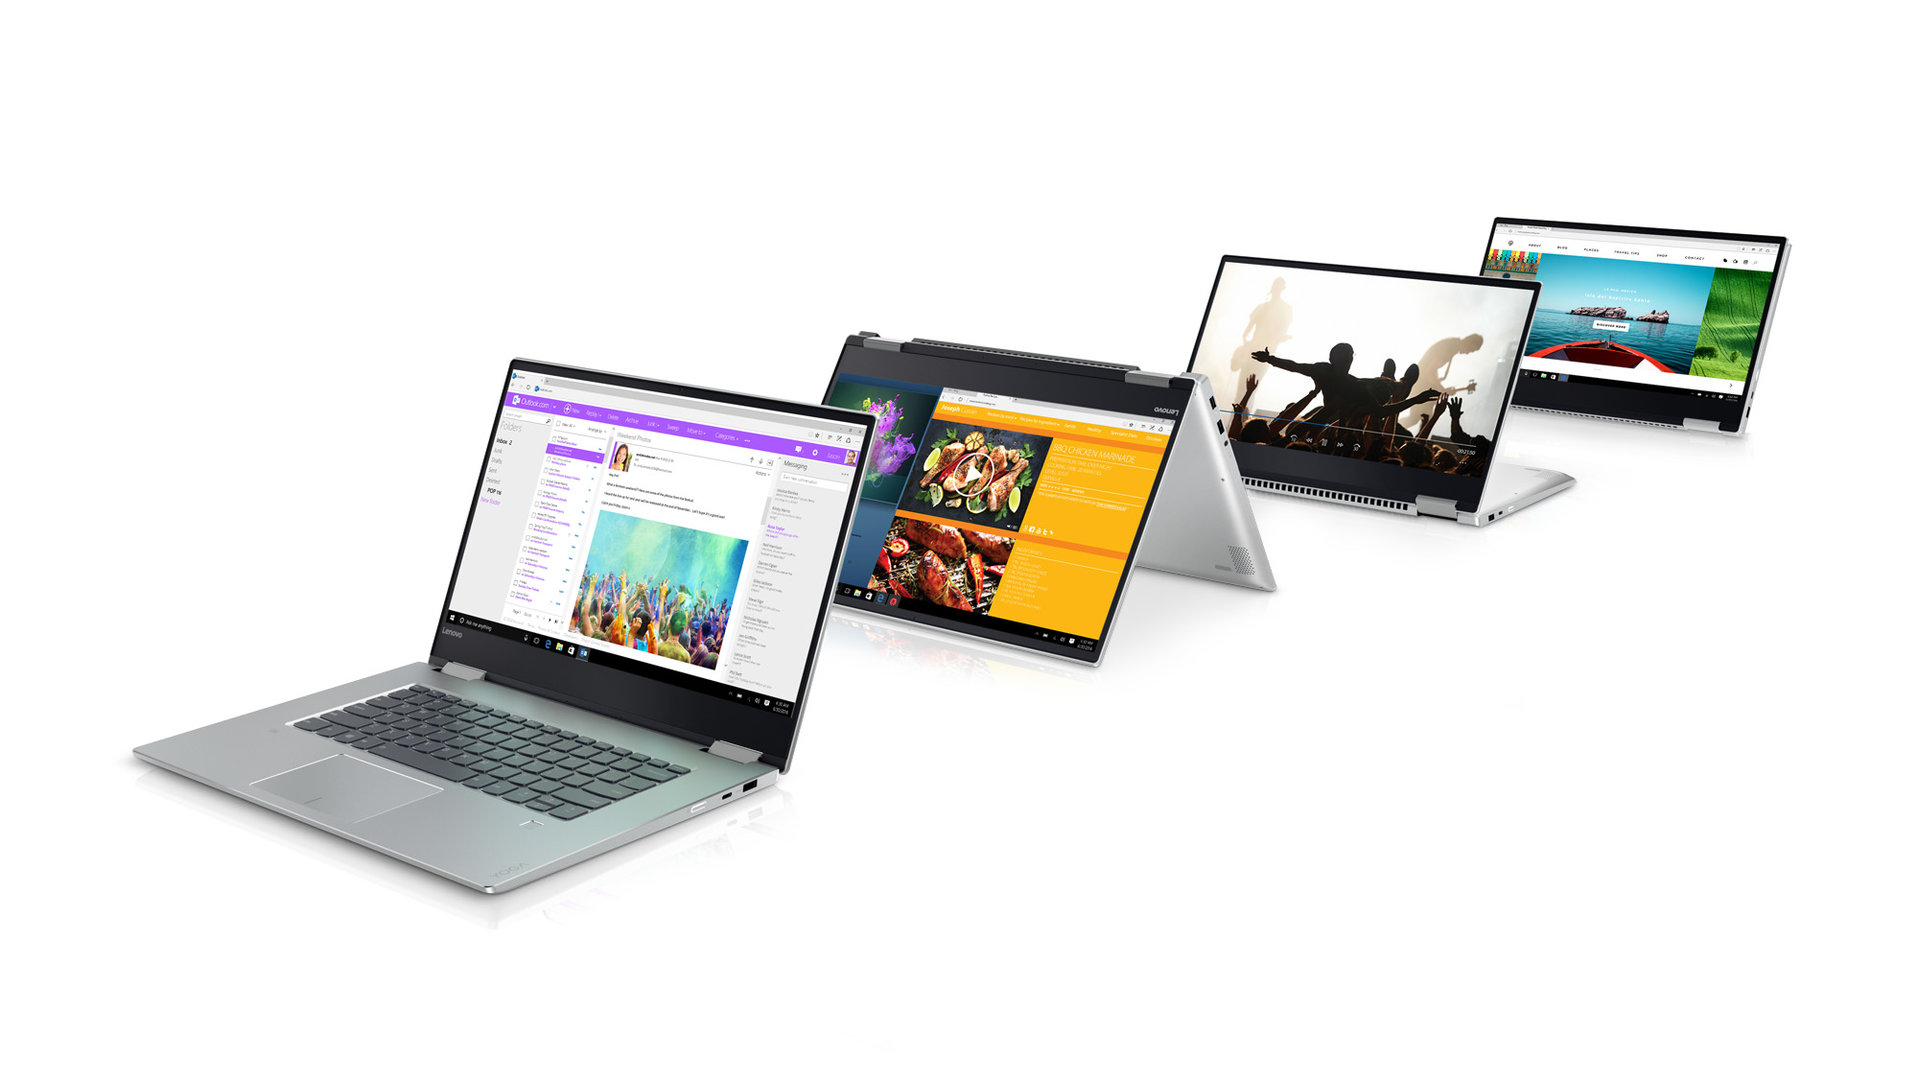 Lenovo Yoga 720 (15 Zoll) in Silber